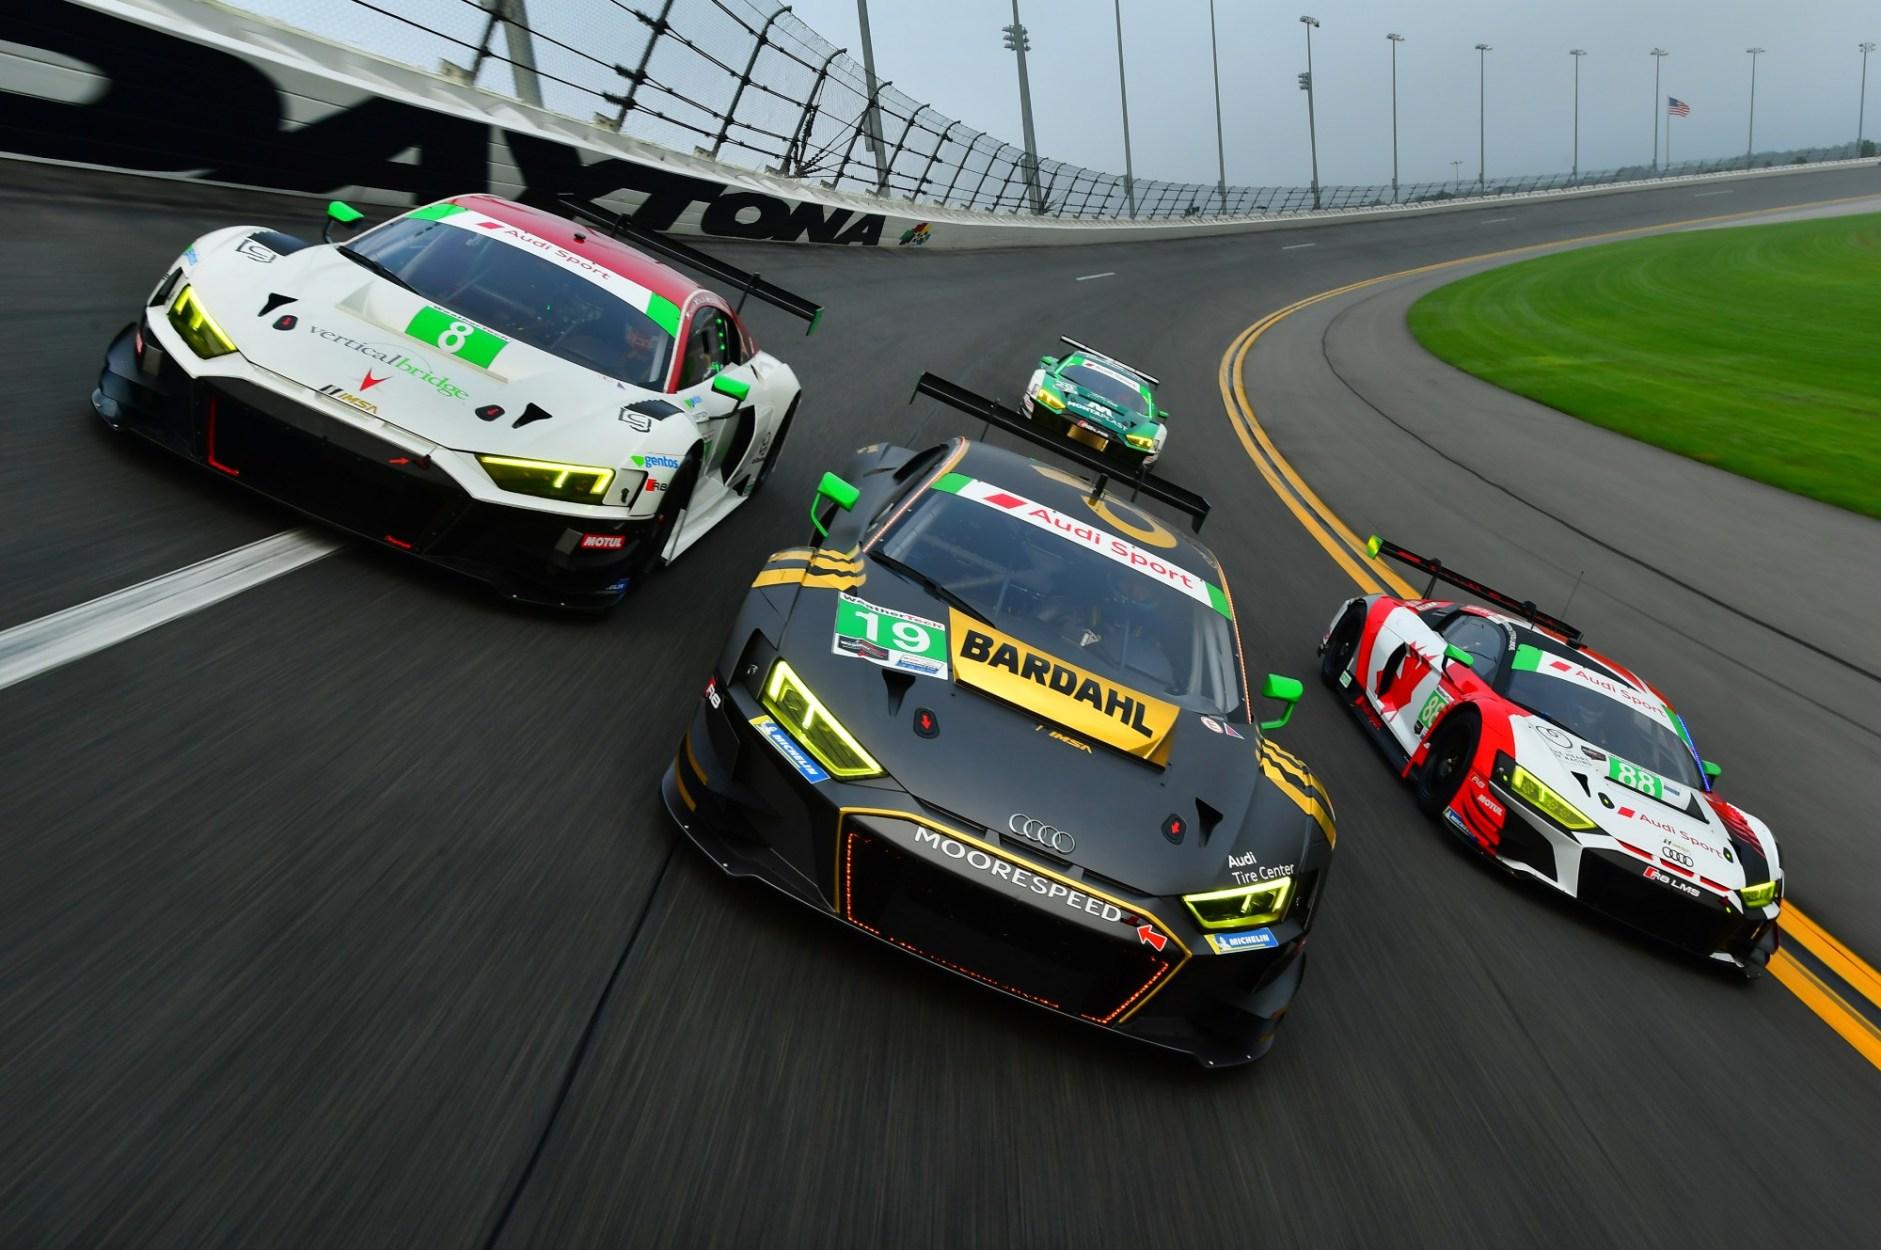 Audi Sport customer racing Announces 2019 Line-Up For IMSA WeatherTech and Michelin Pilot Challenge Racing Series Ahead of Daytona Season Opener